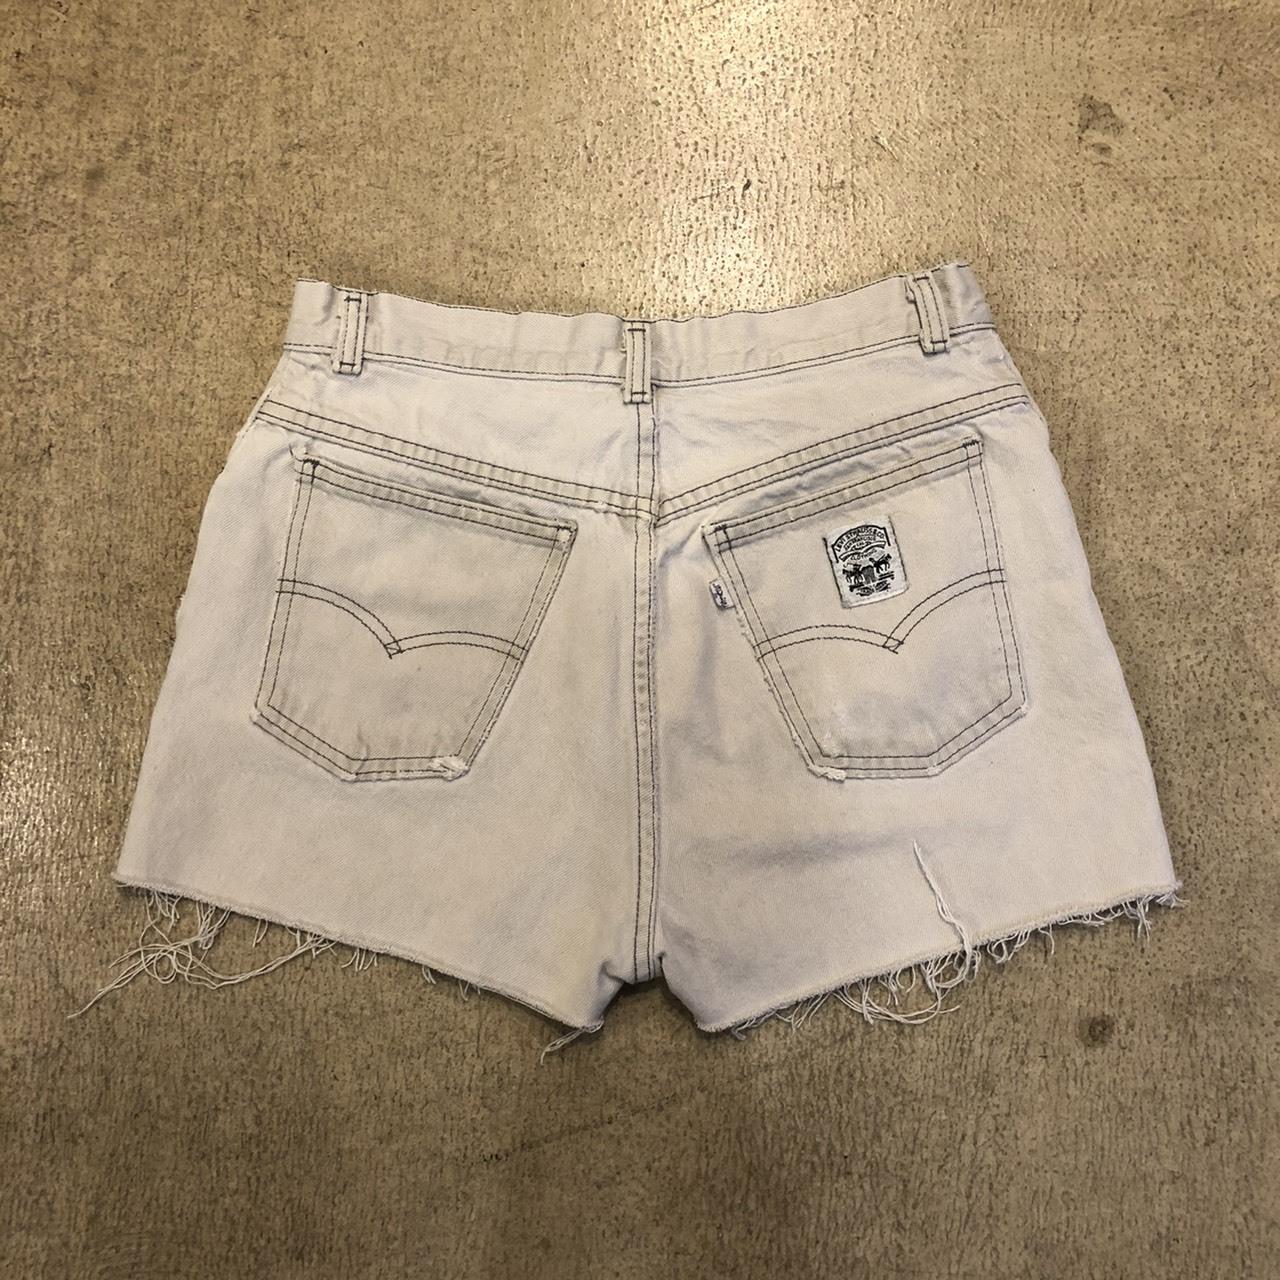 Vintage Levi's Denim Shorts ¥4,600+tax